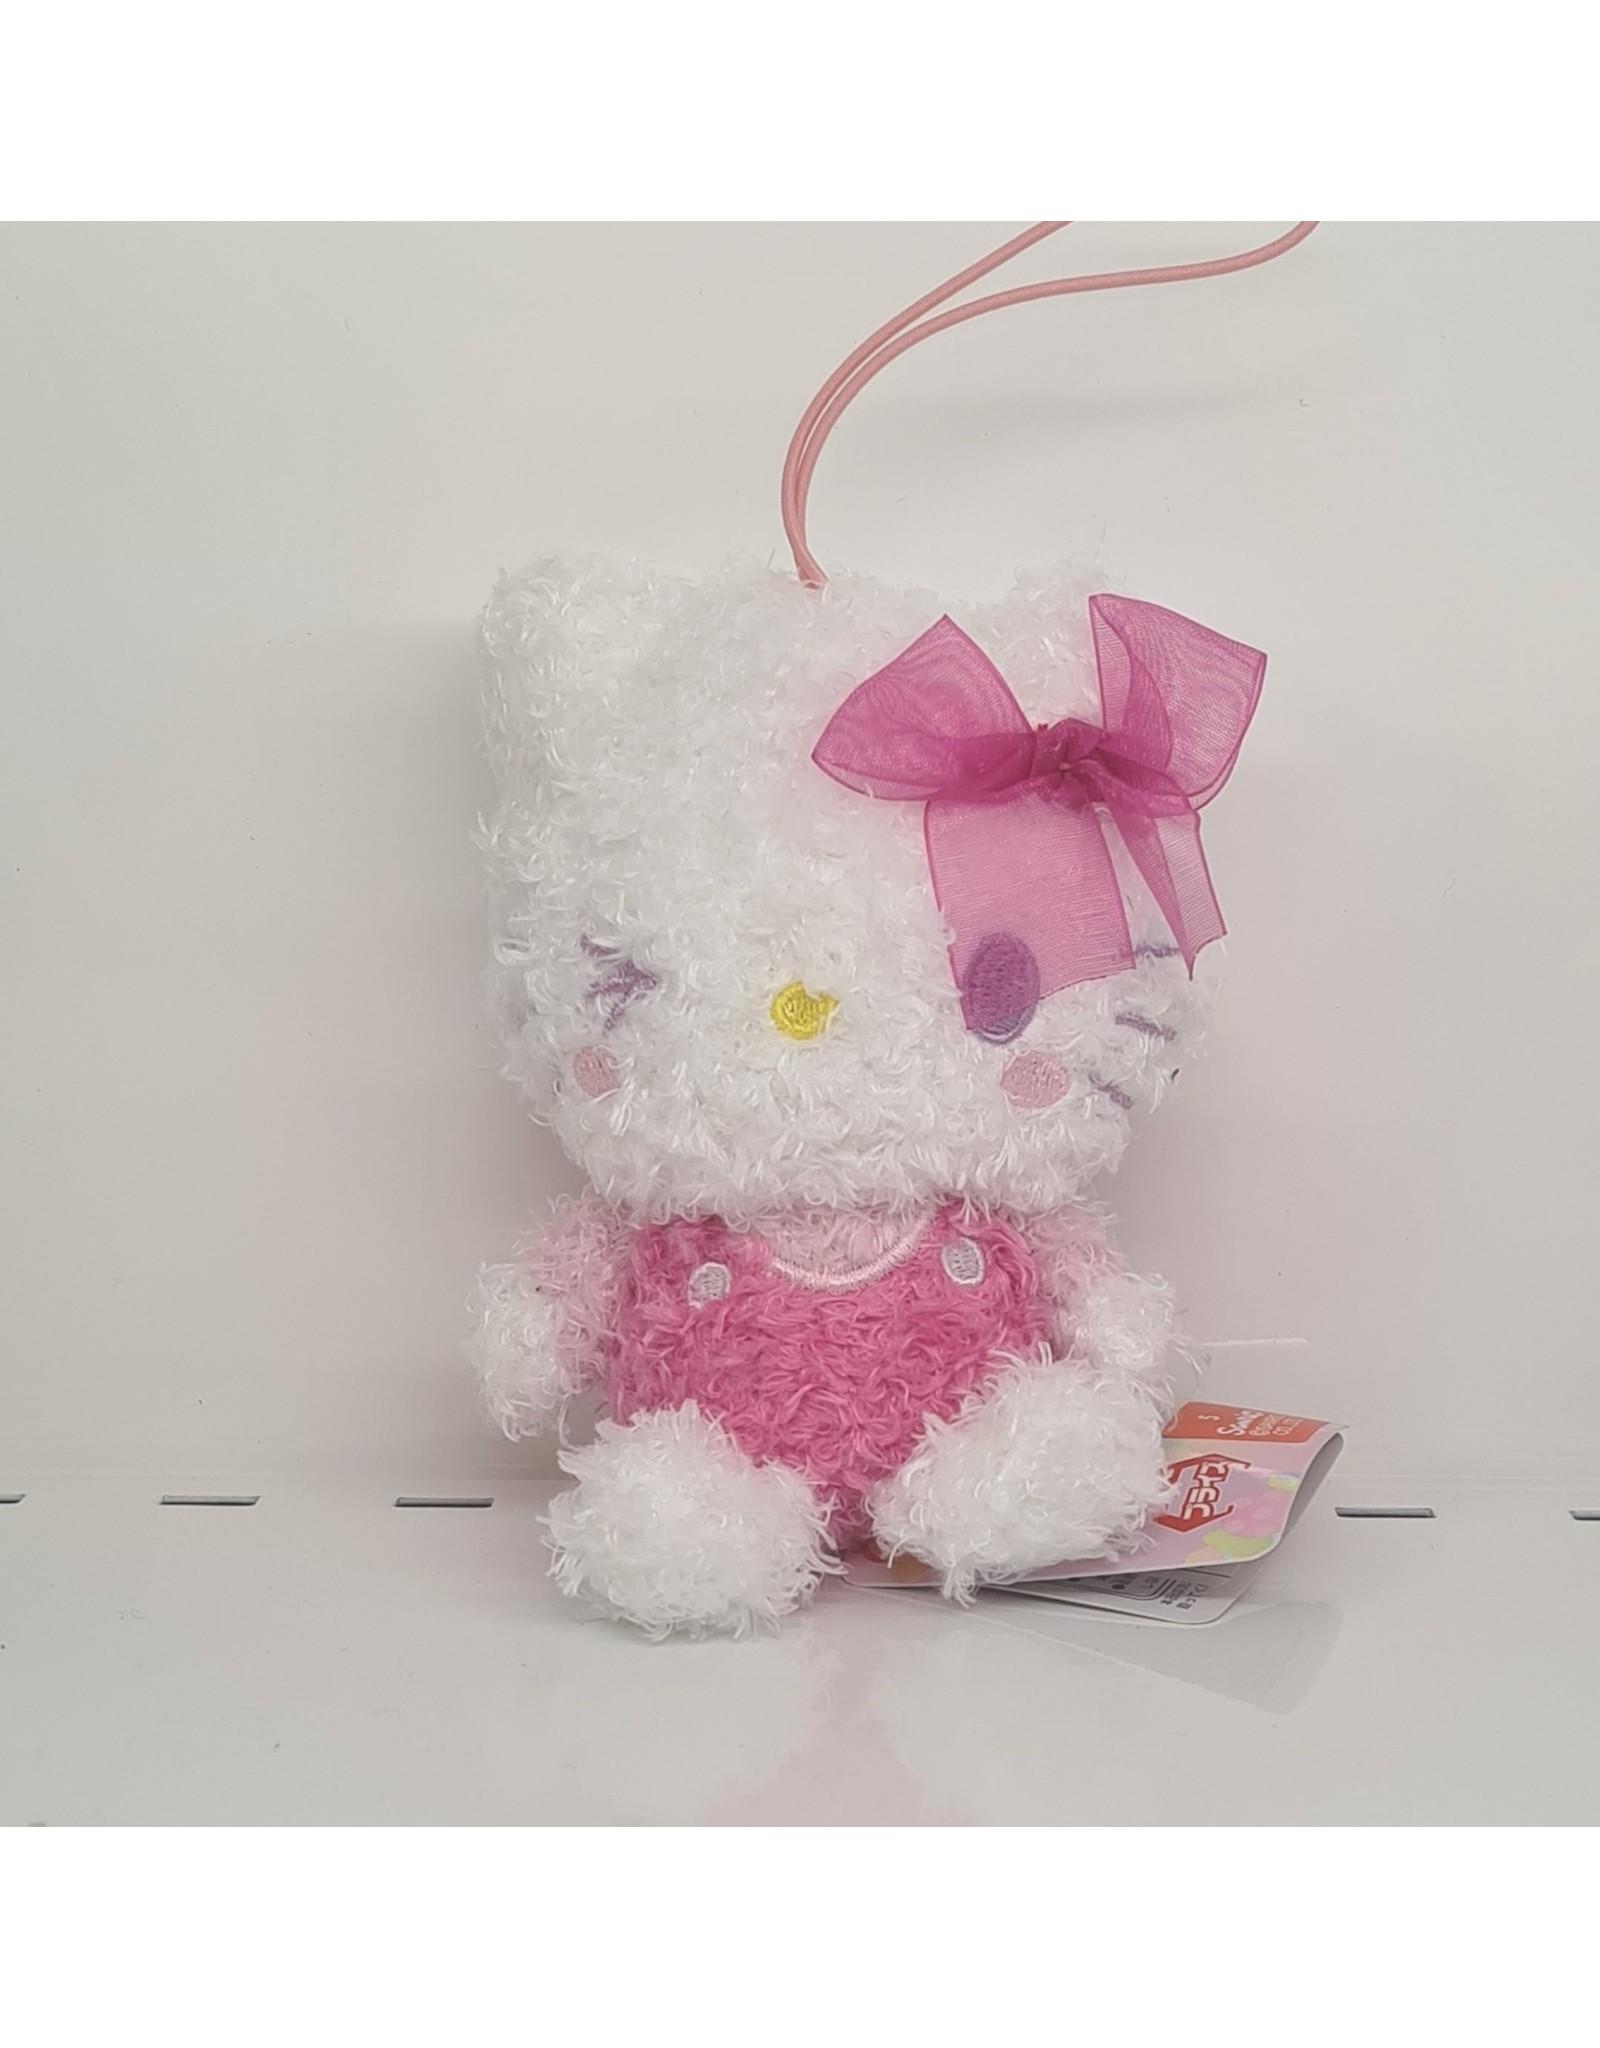 Sanrio Cotton Candy Ribbon Plush - Hello Kitty - 10 cm